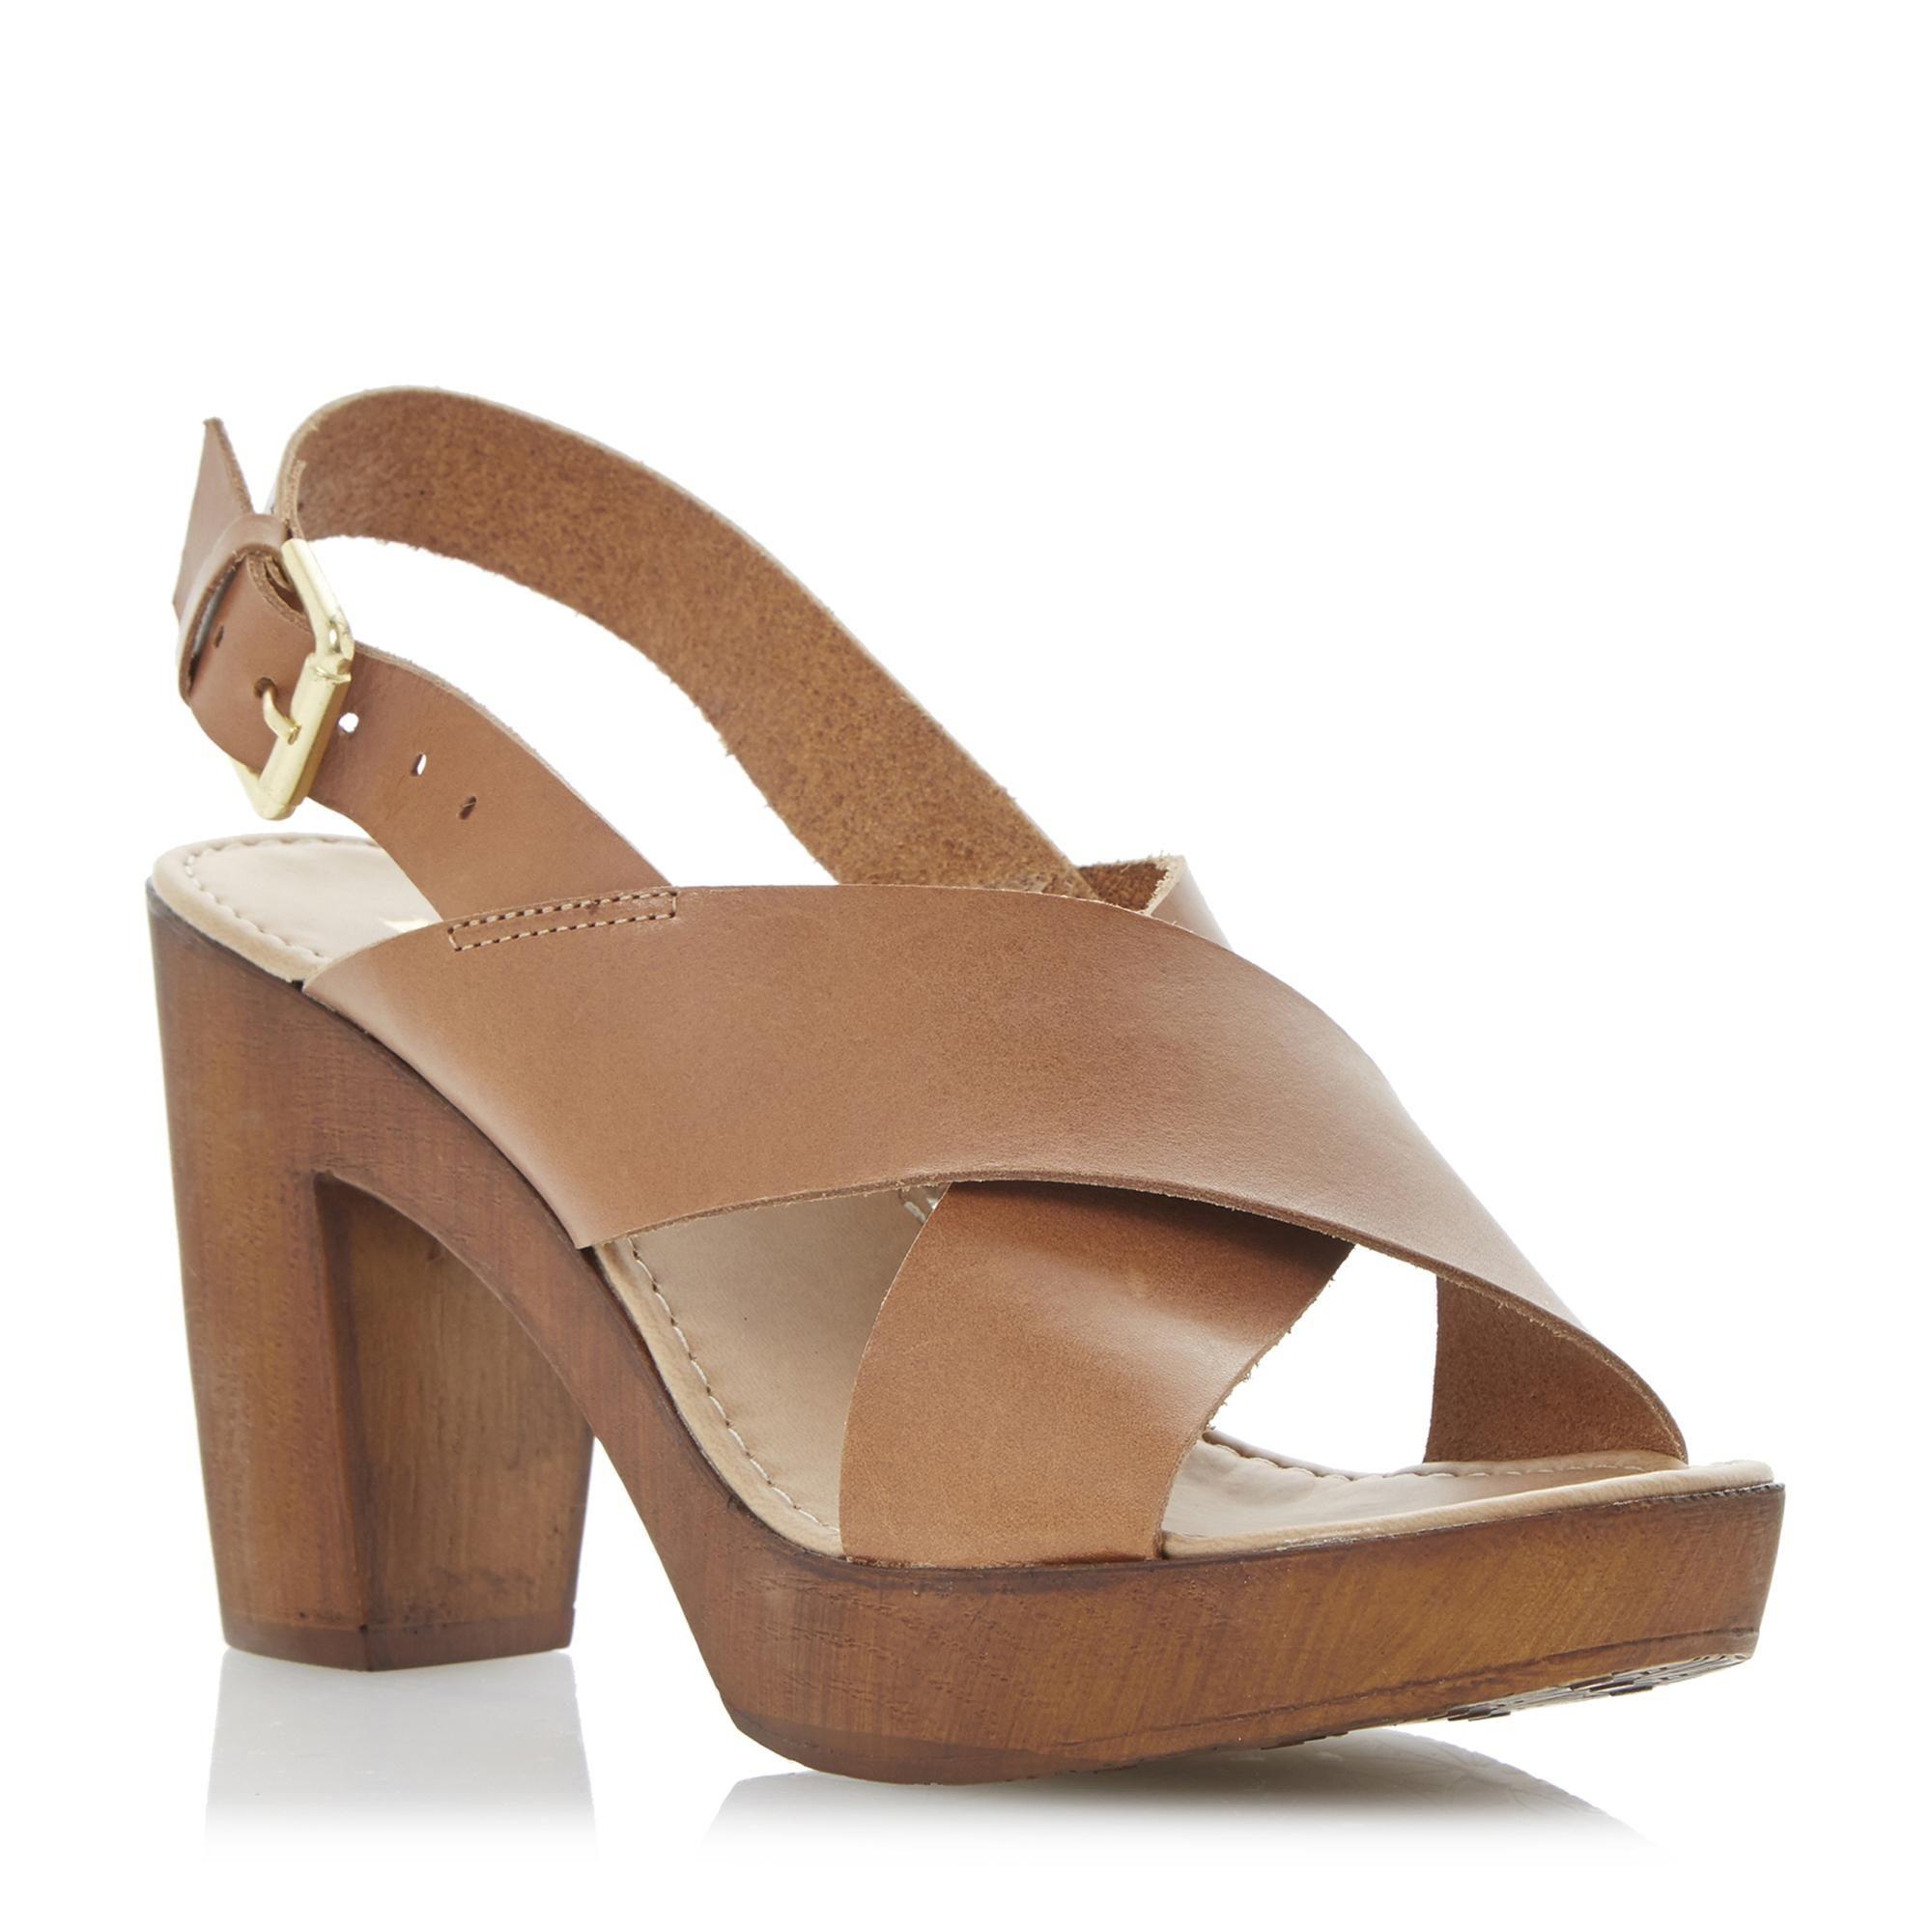 c9134914e89 DUNE LADIES FRAGGEL - Leather Wooden Clog Effect Heeled Sandal - tan ...